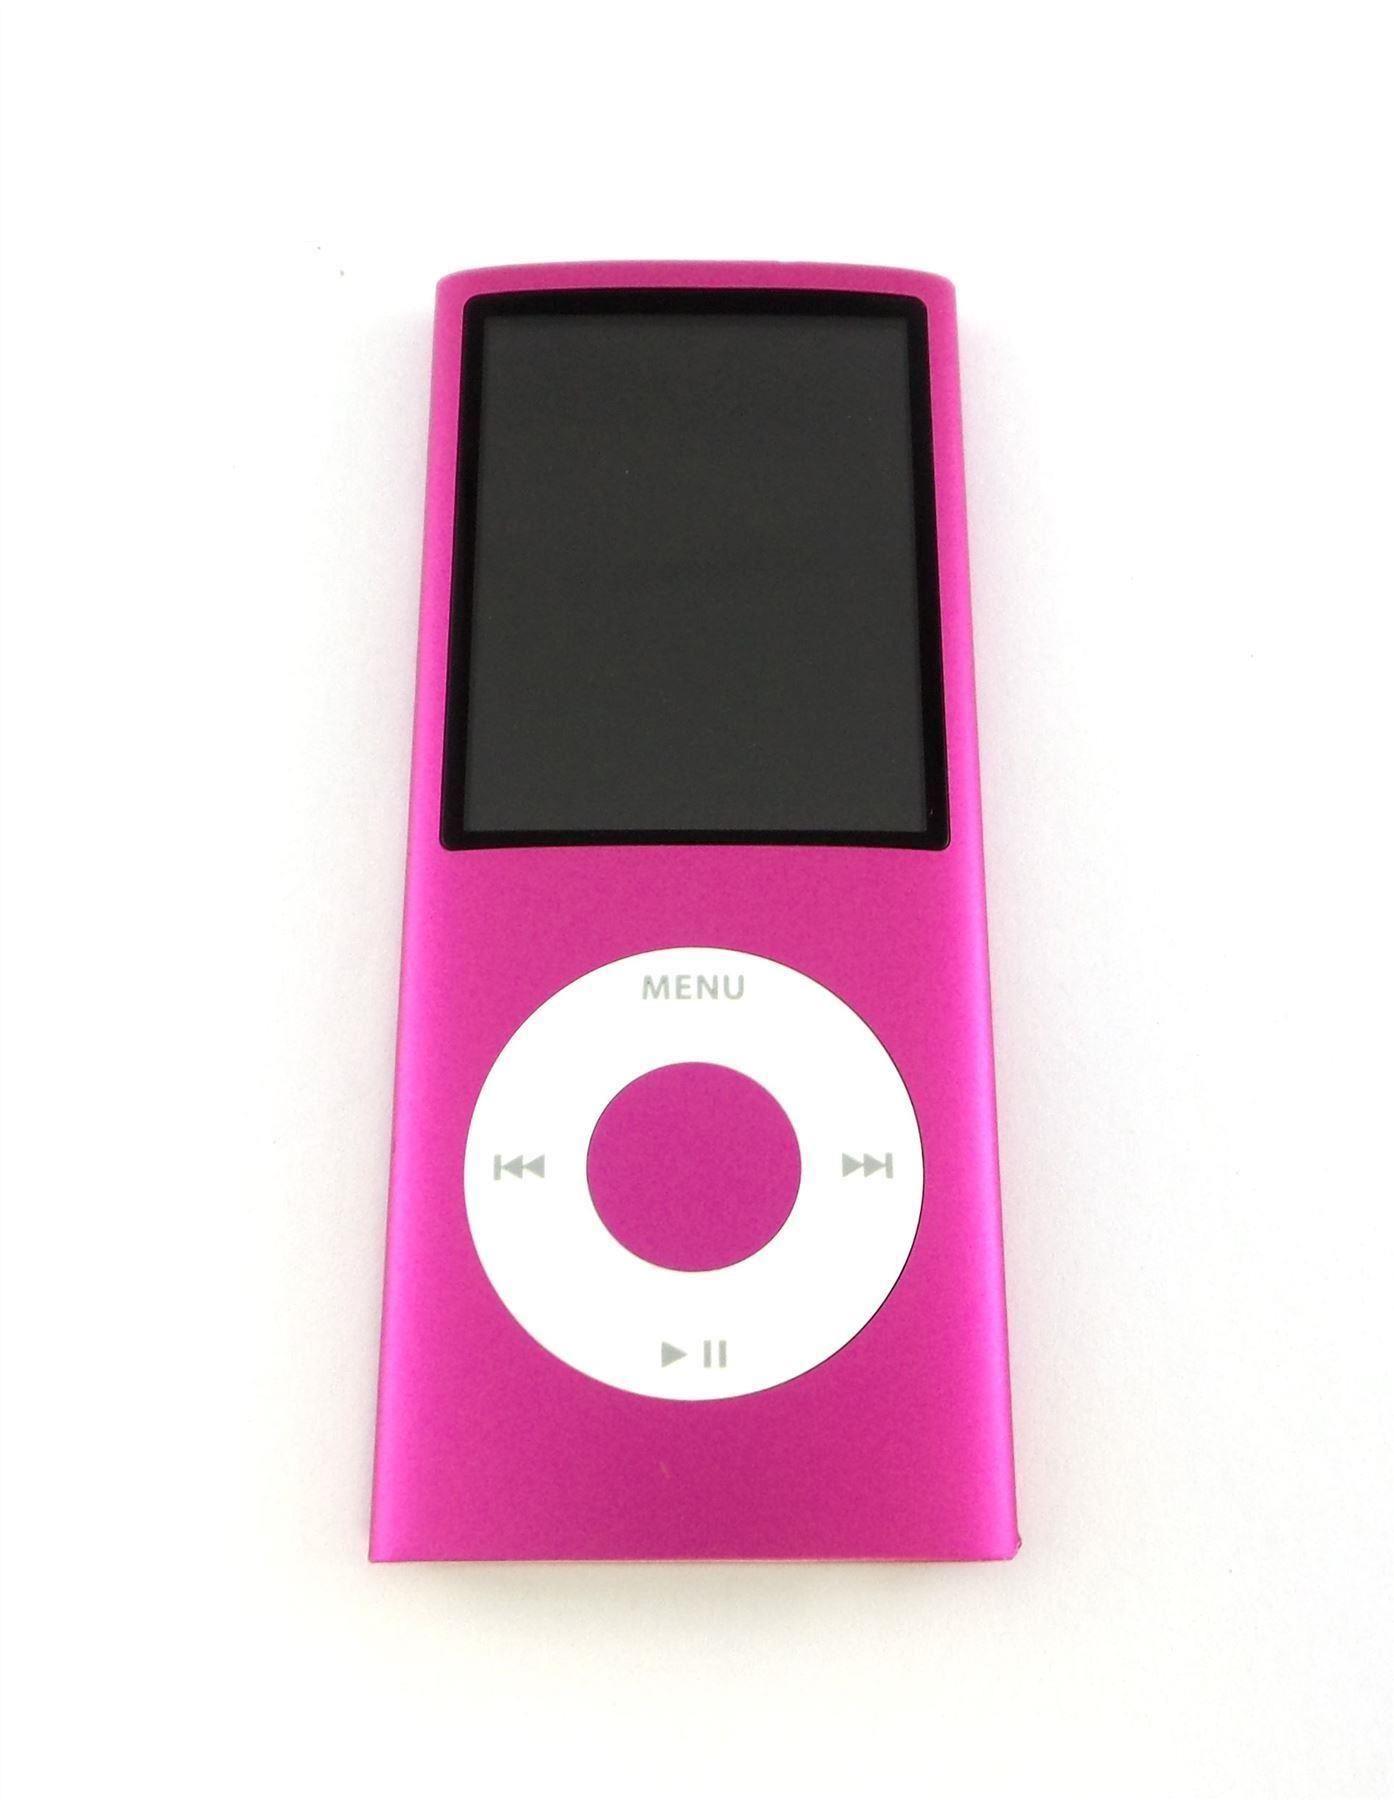 apple ipod nano 4th gen 8gb pink mb735ll a fpo see. Black Bedroom Furniture Sets. Home Design Ideas